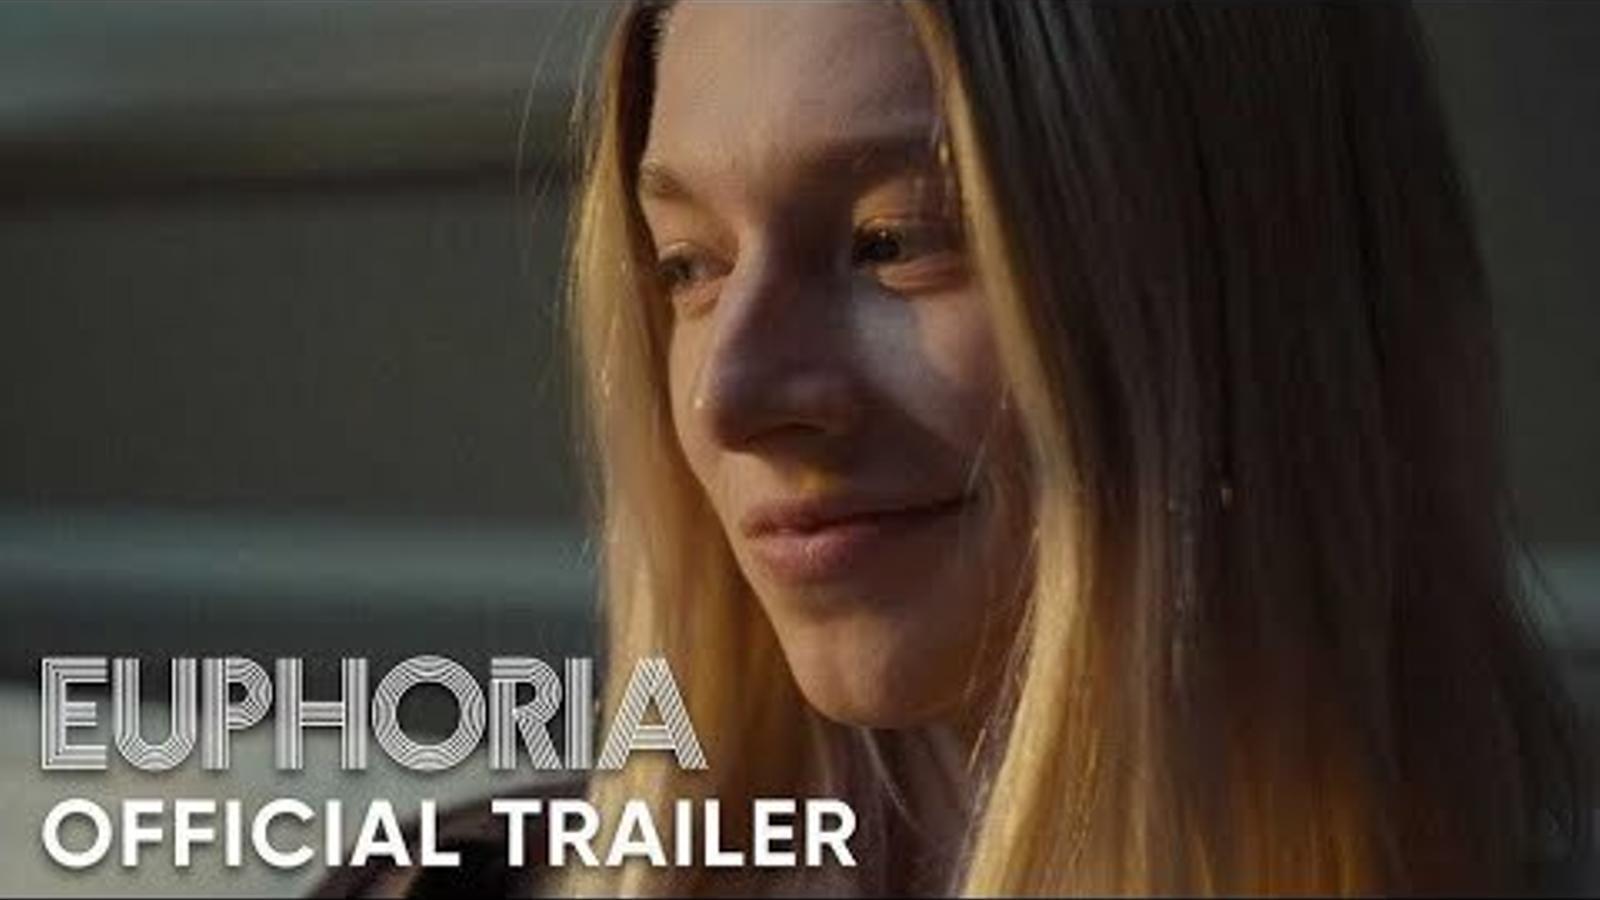 'Euphoria', episodi especial 2, tràiler